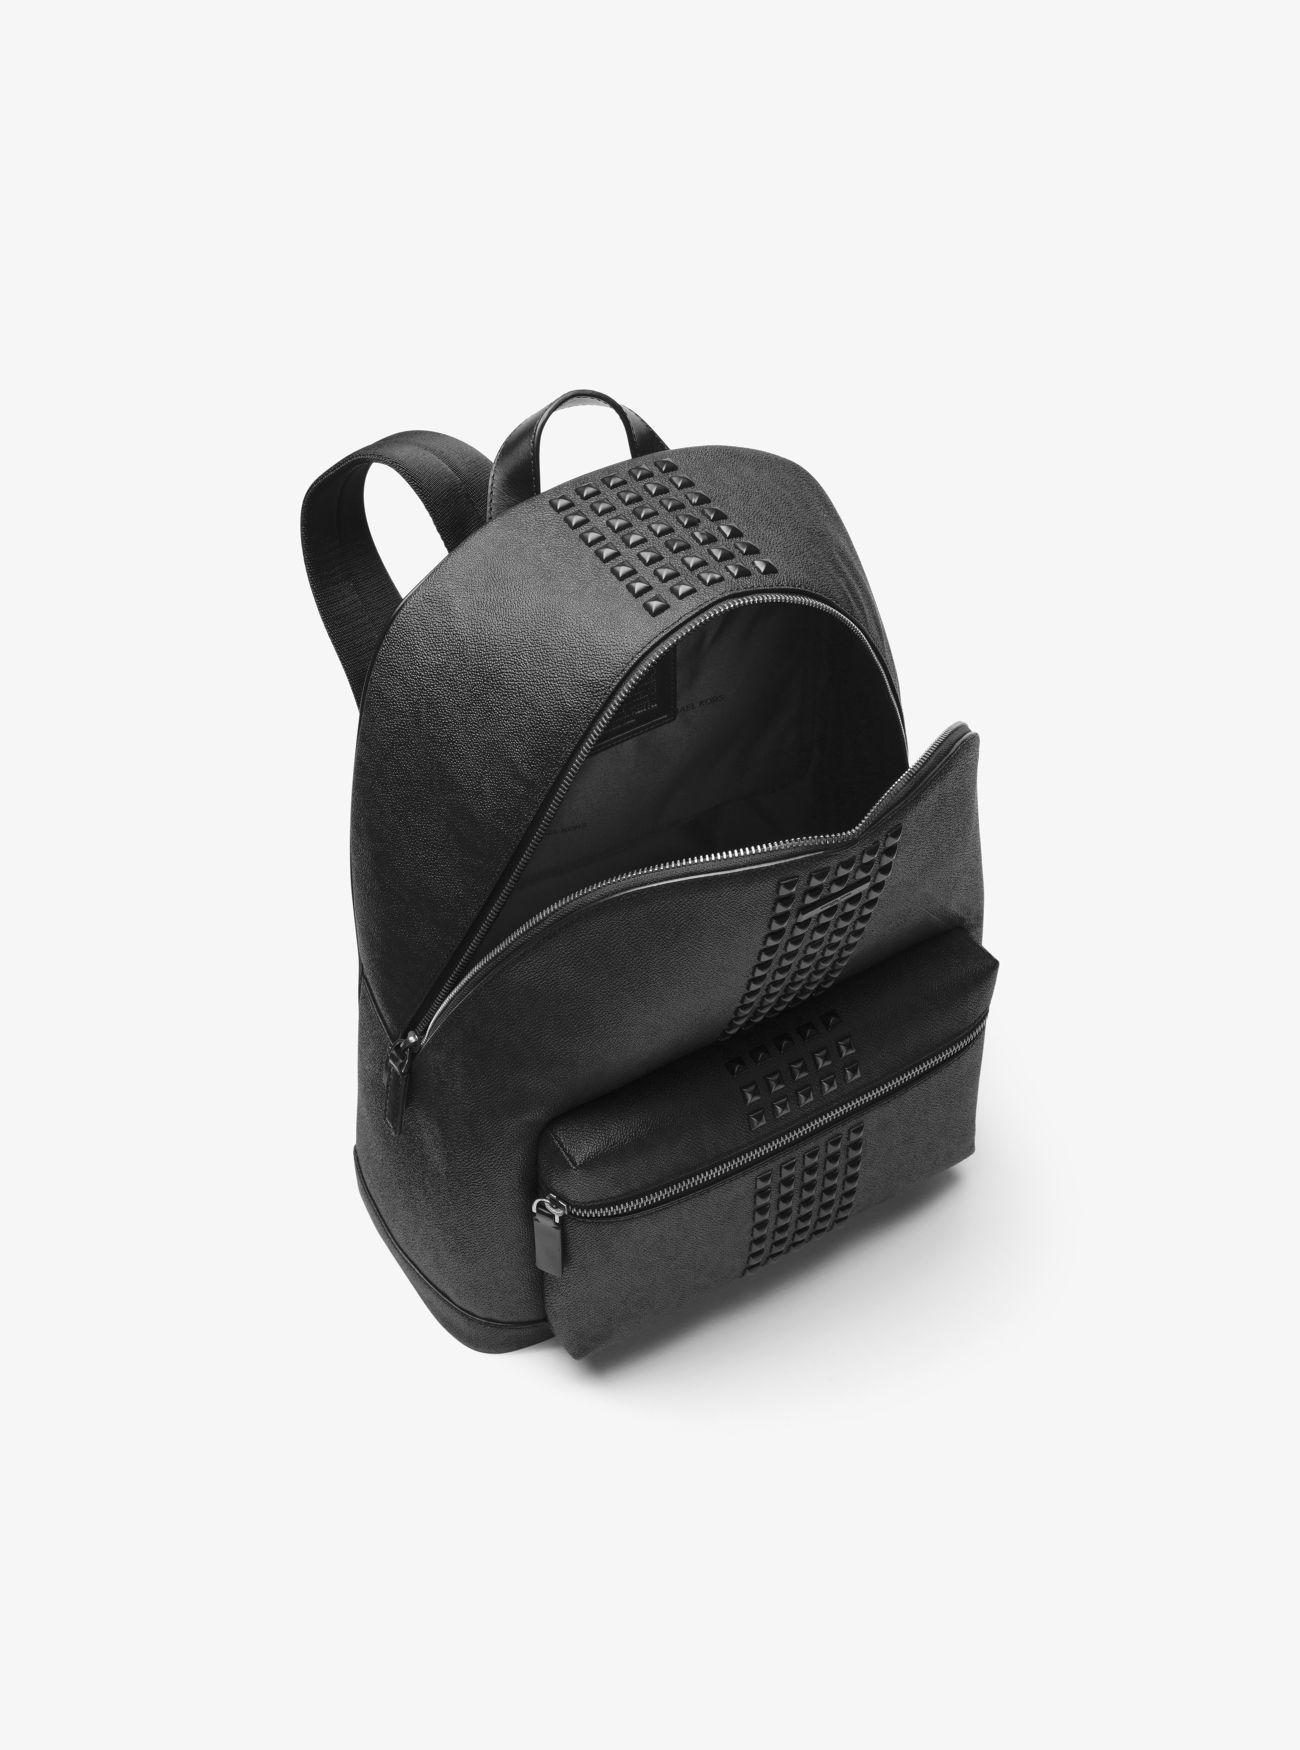 2c9fa17629ac Lyst - Michael Kors Jet Set Studded Logo Backpack in Black for Men